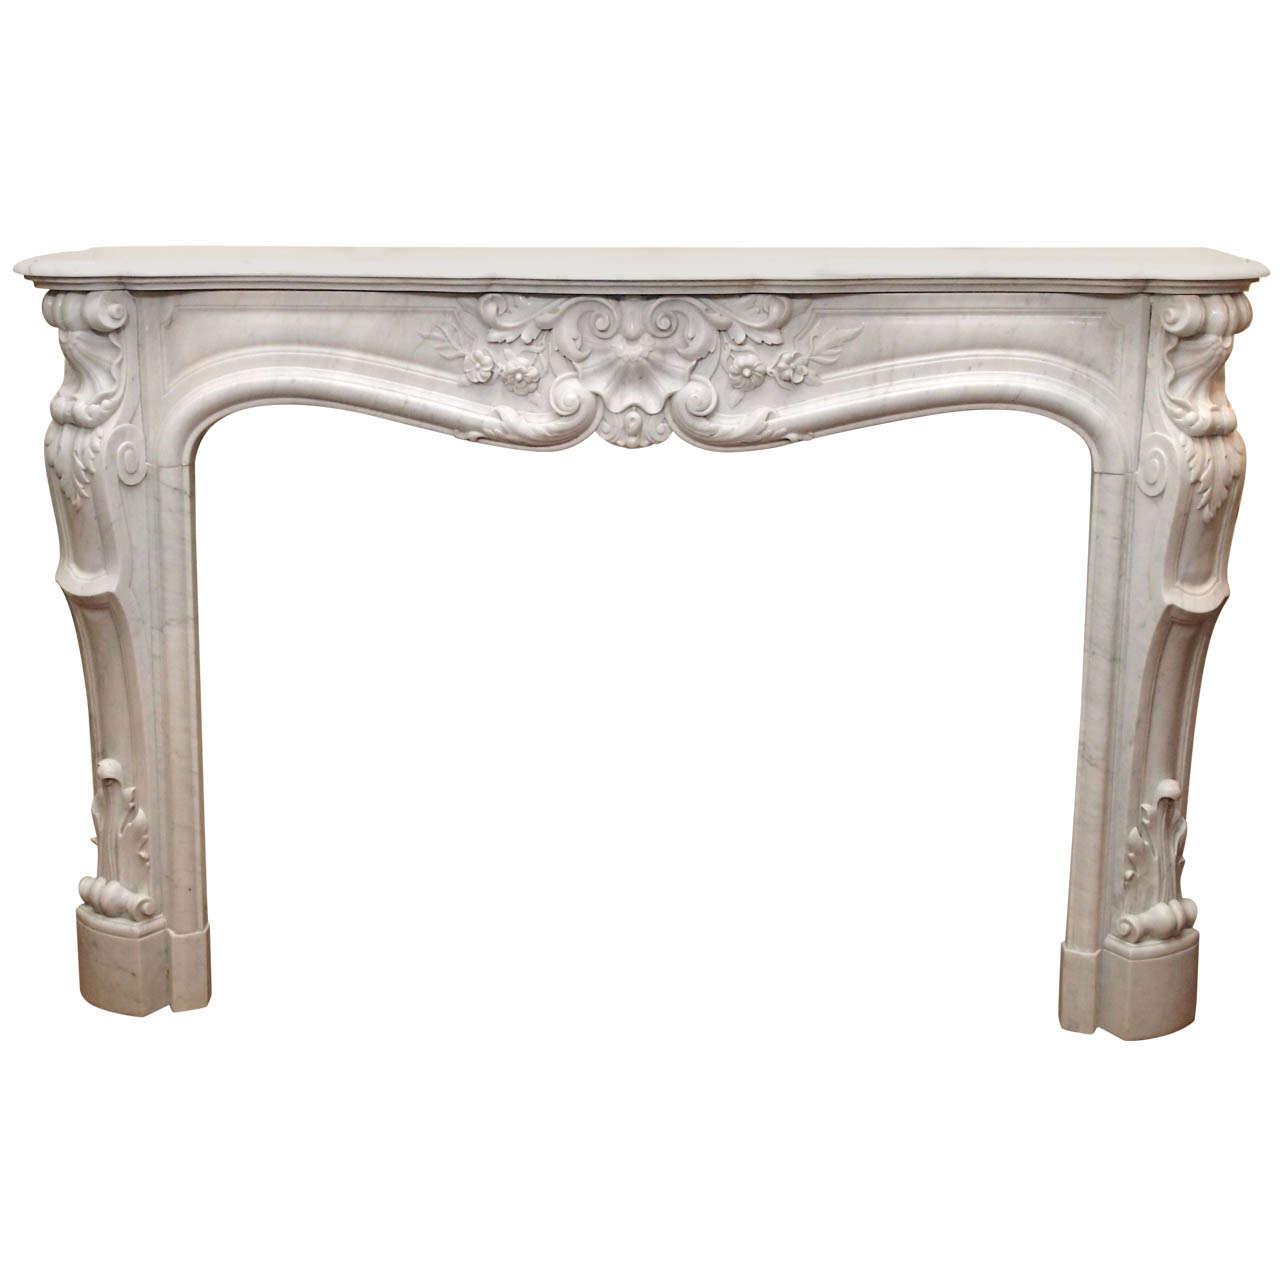 antique frenchg carrara marble mantel circa 1860 1870 at